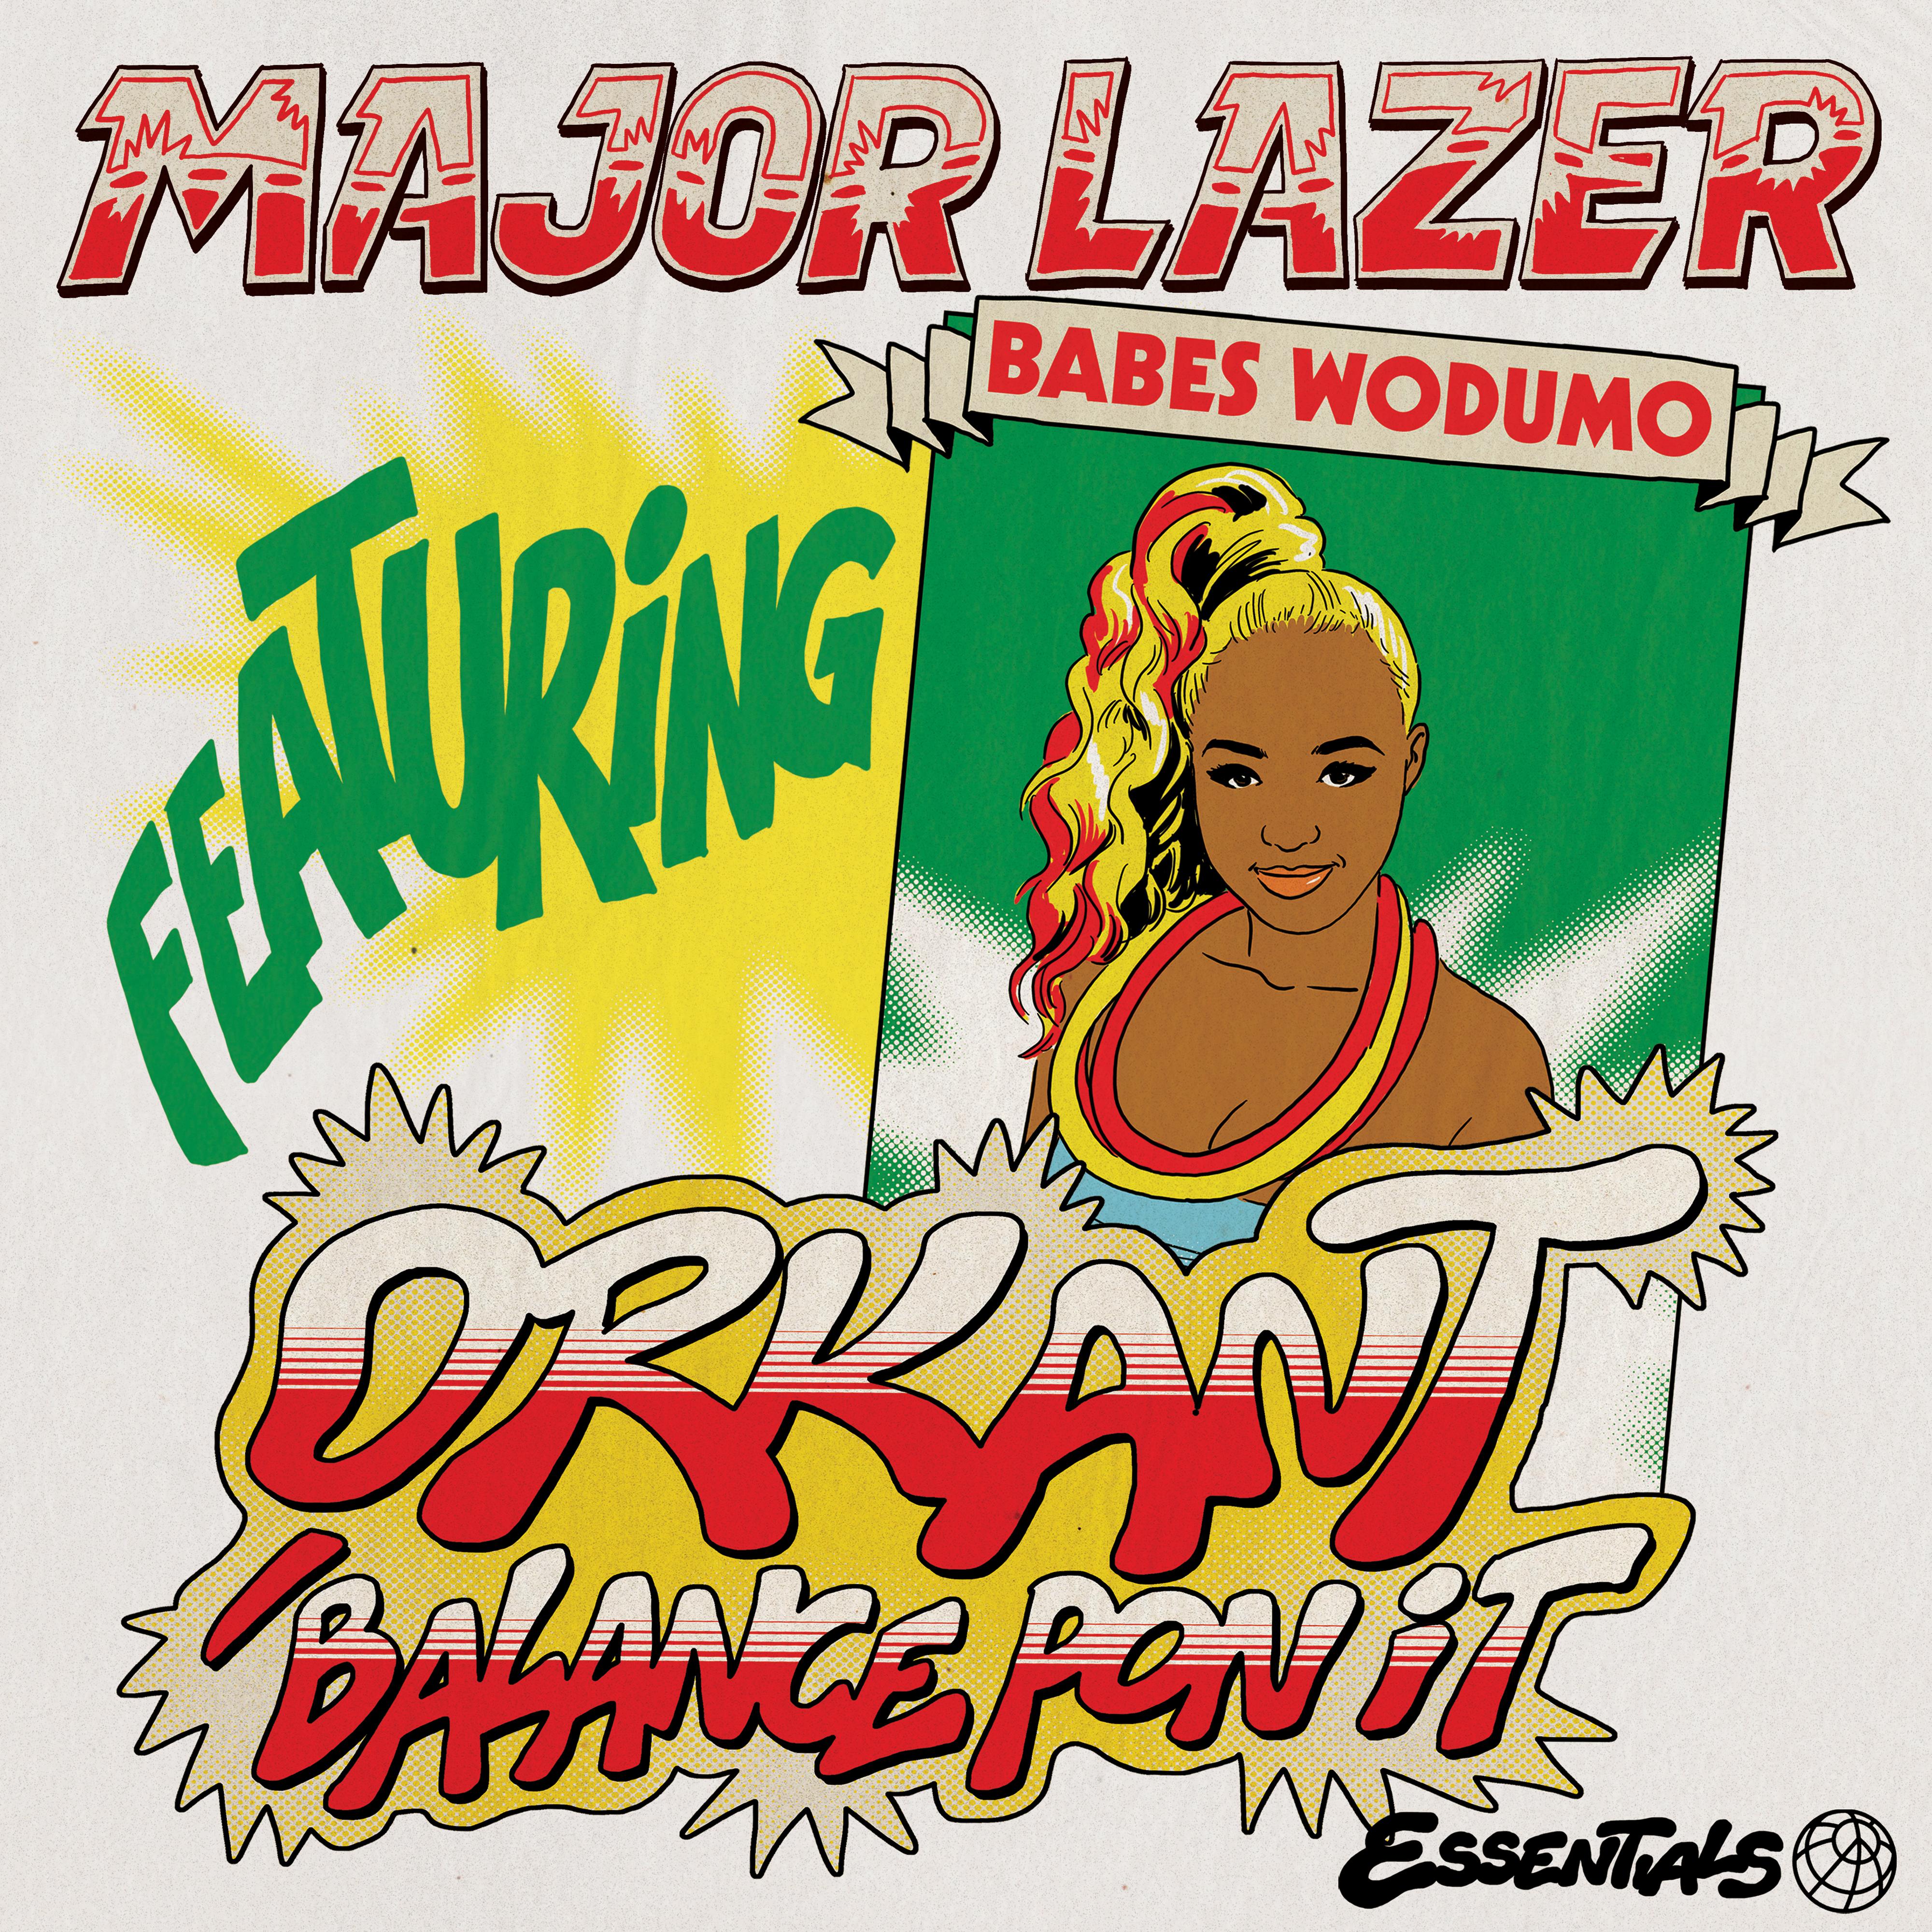 VIDEO: Major Lazer ft. Babes Wodumo - Orkant / Balance Pon It